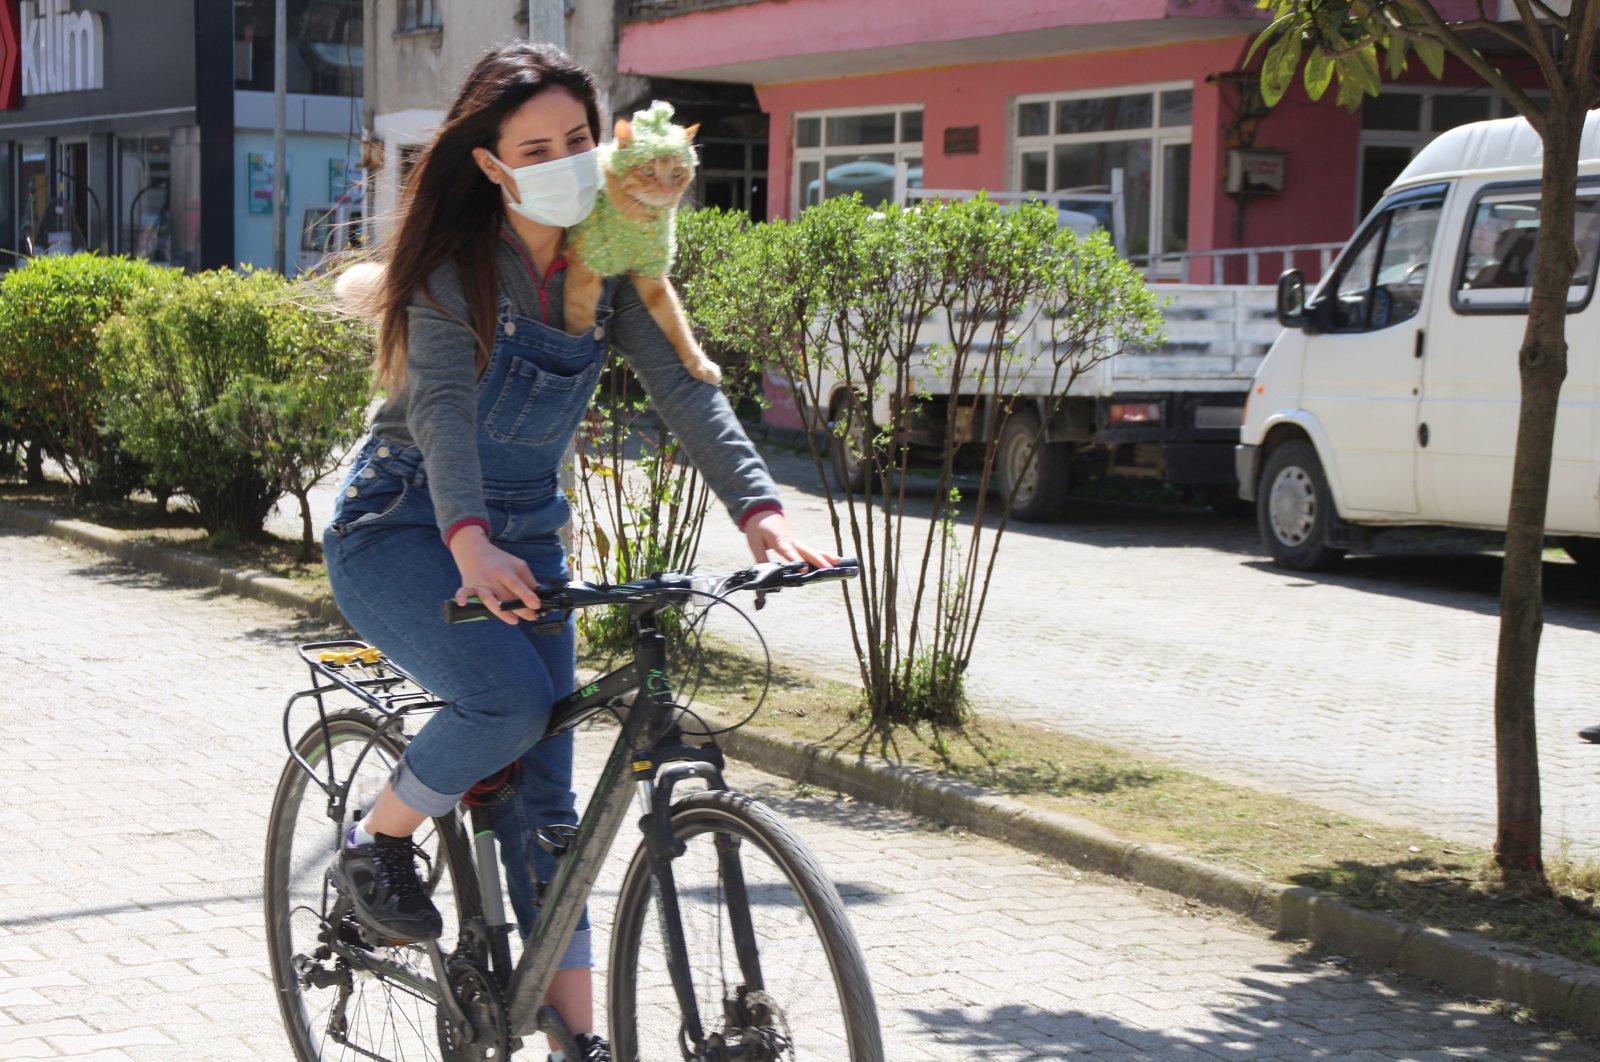 Özge Kübra Teymur bikes along a road with her cat Azman resting on her shoulders, Rize, Turkey, April 20, 2021. (DHA Photo)